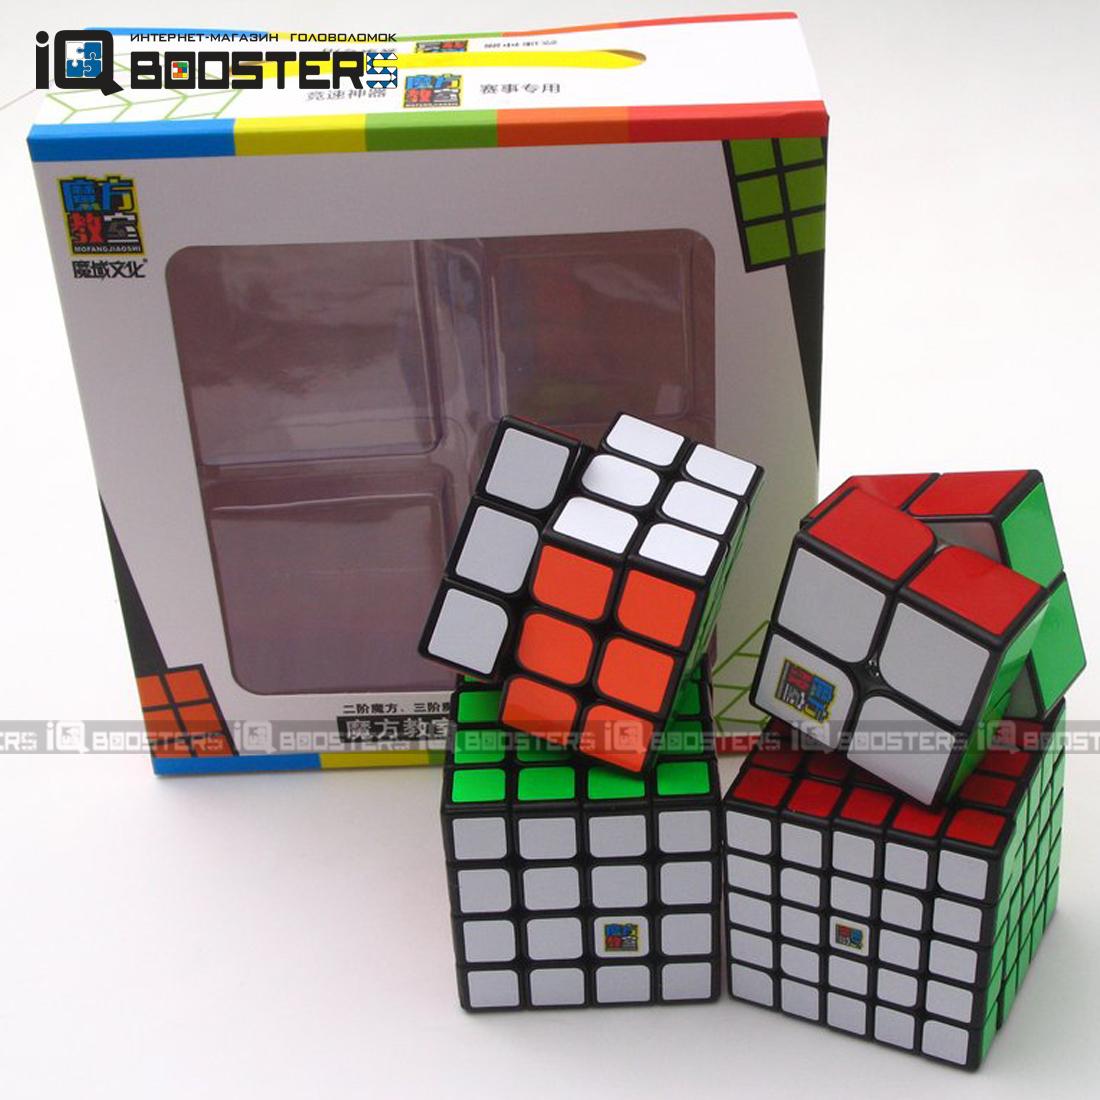 сс_2-5_giftbox_b1